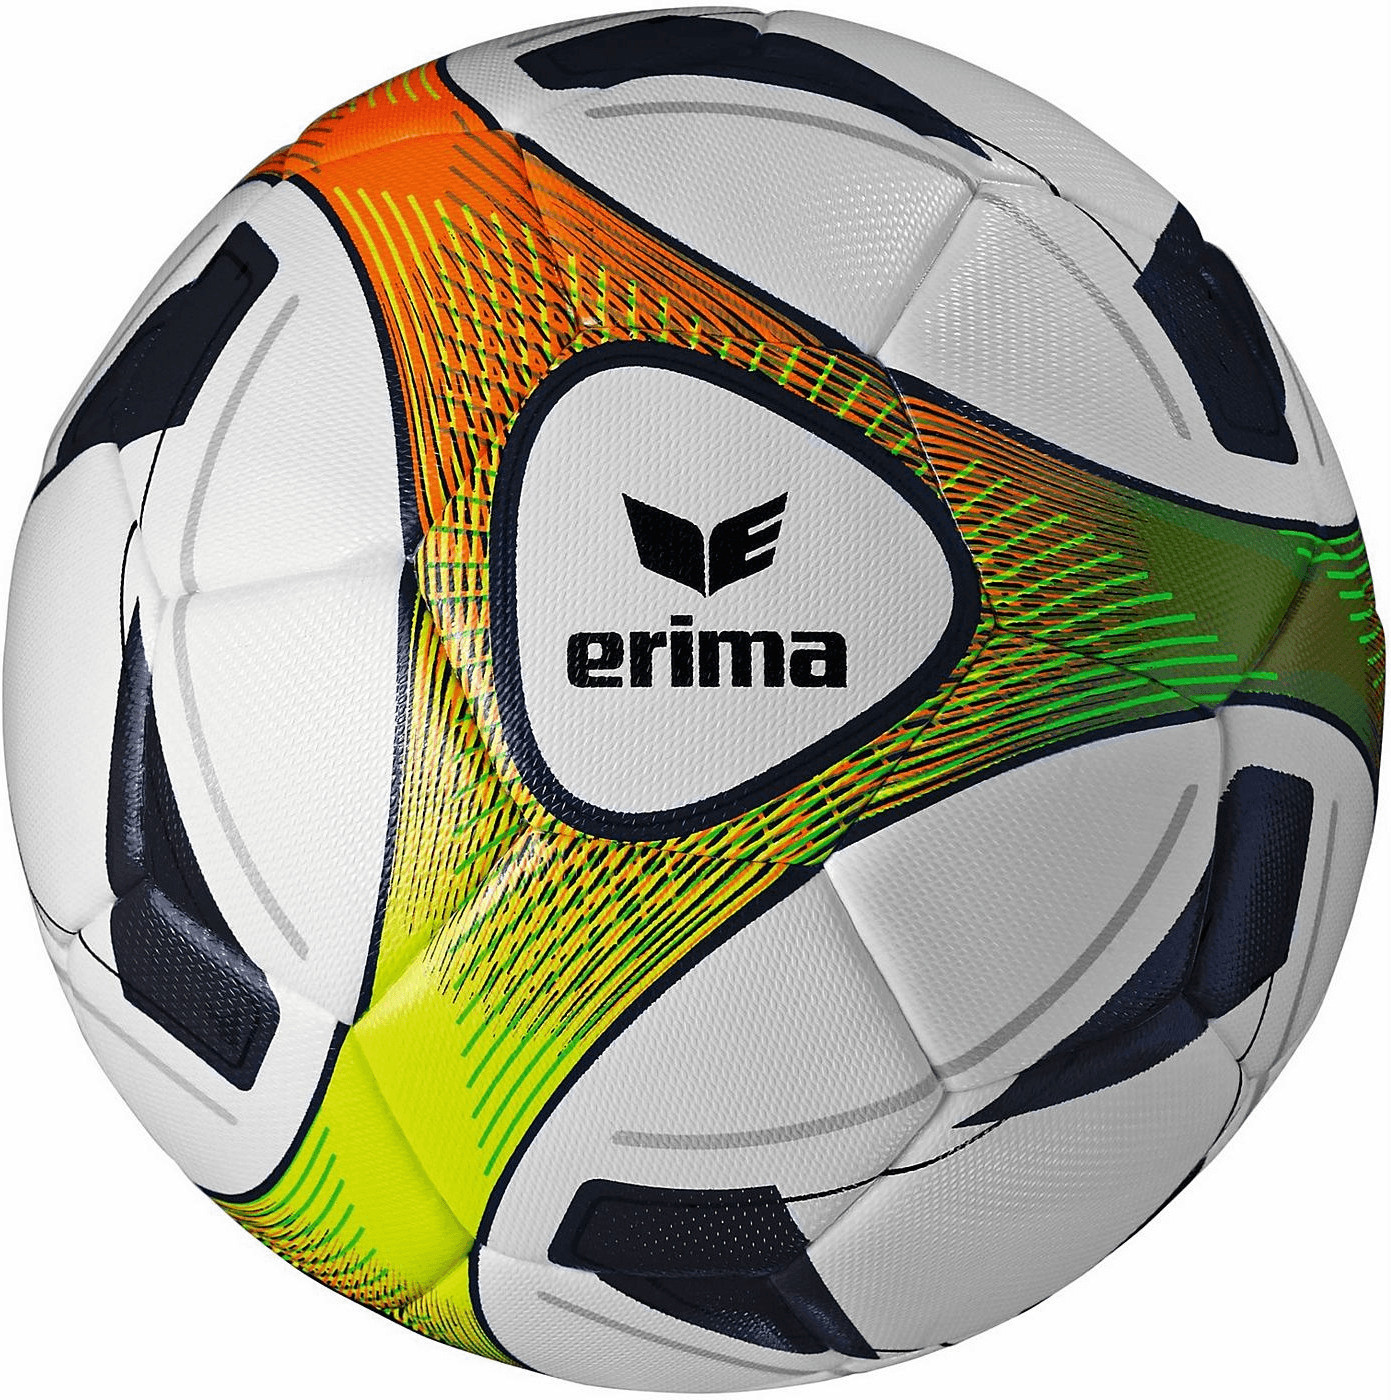 5 Bälle Ballsack Fußball Tasche Beutel Netz Teamsport Derbystar Ballschlauch